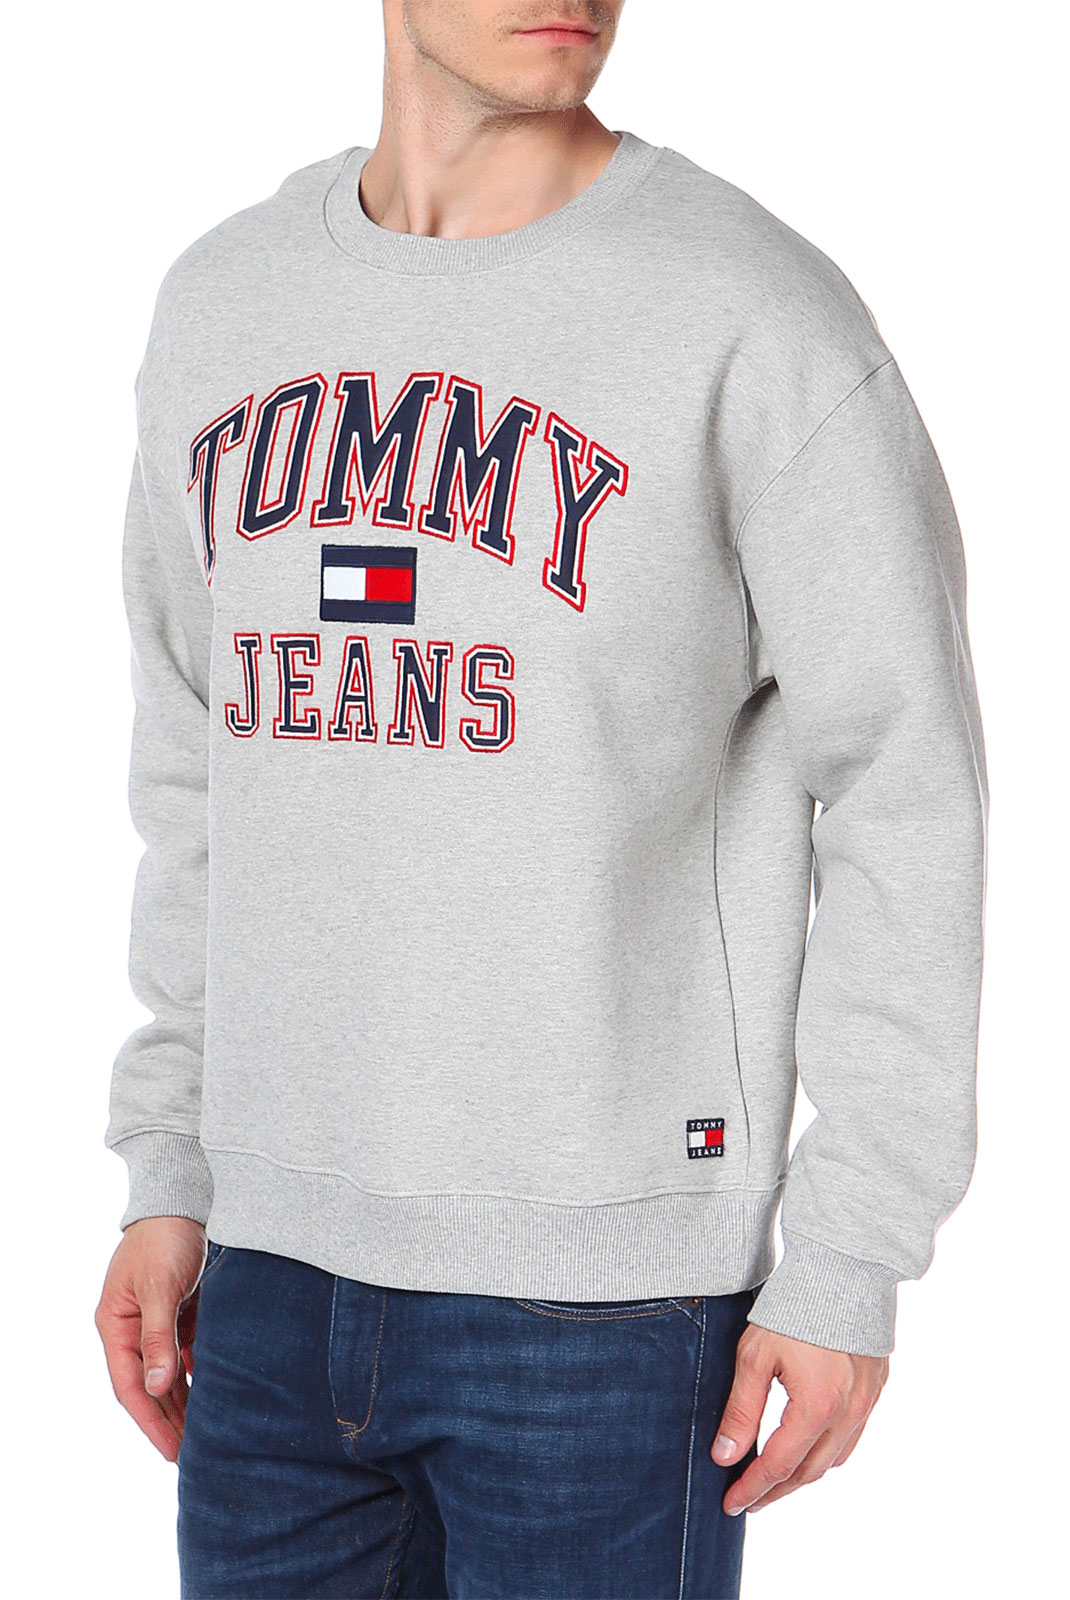 Sweatshirts  Tommy Jeans DM0DM03995009 009 GREY MARL